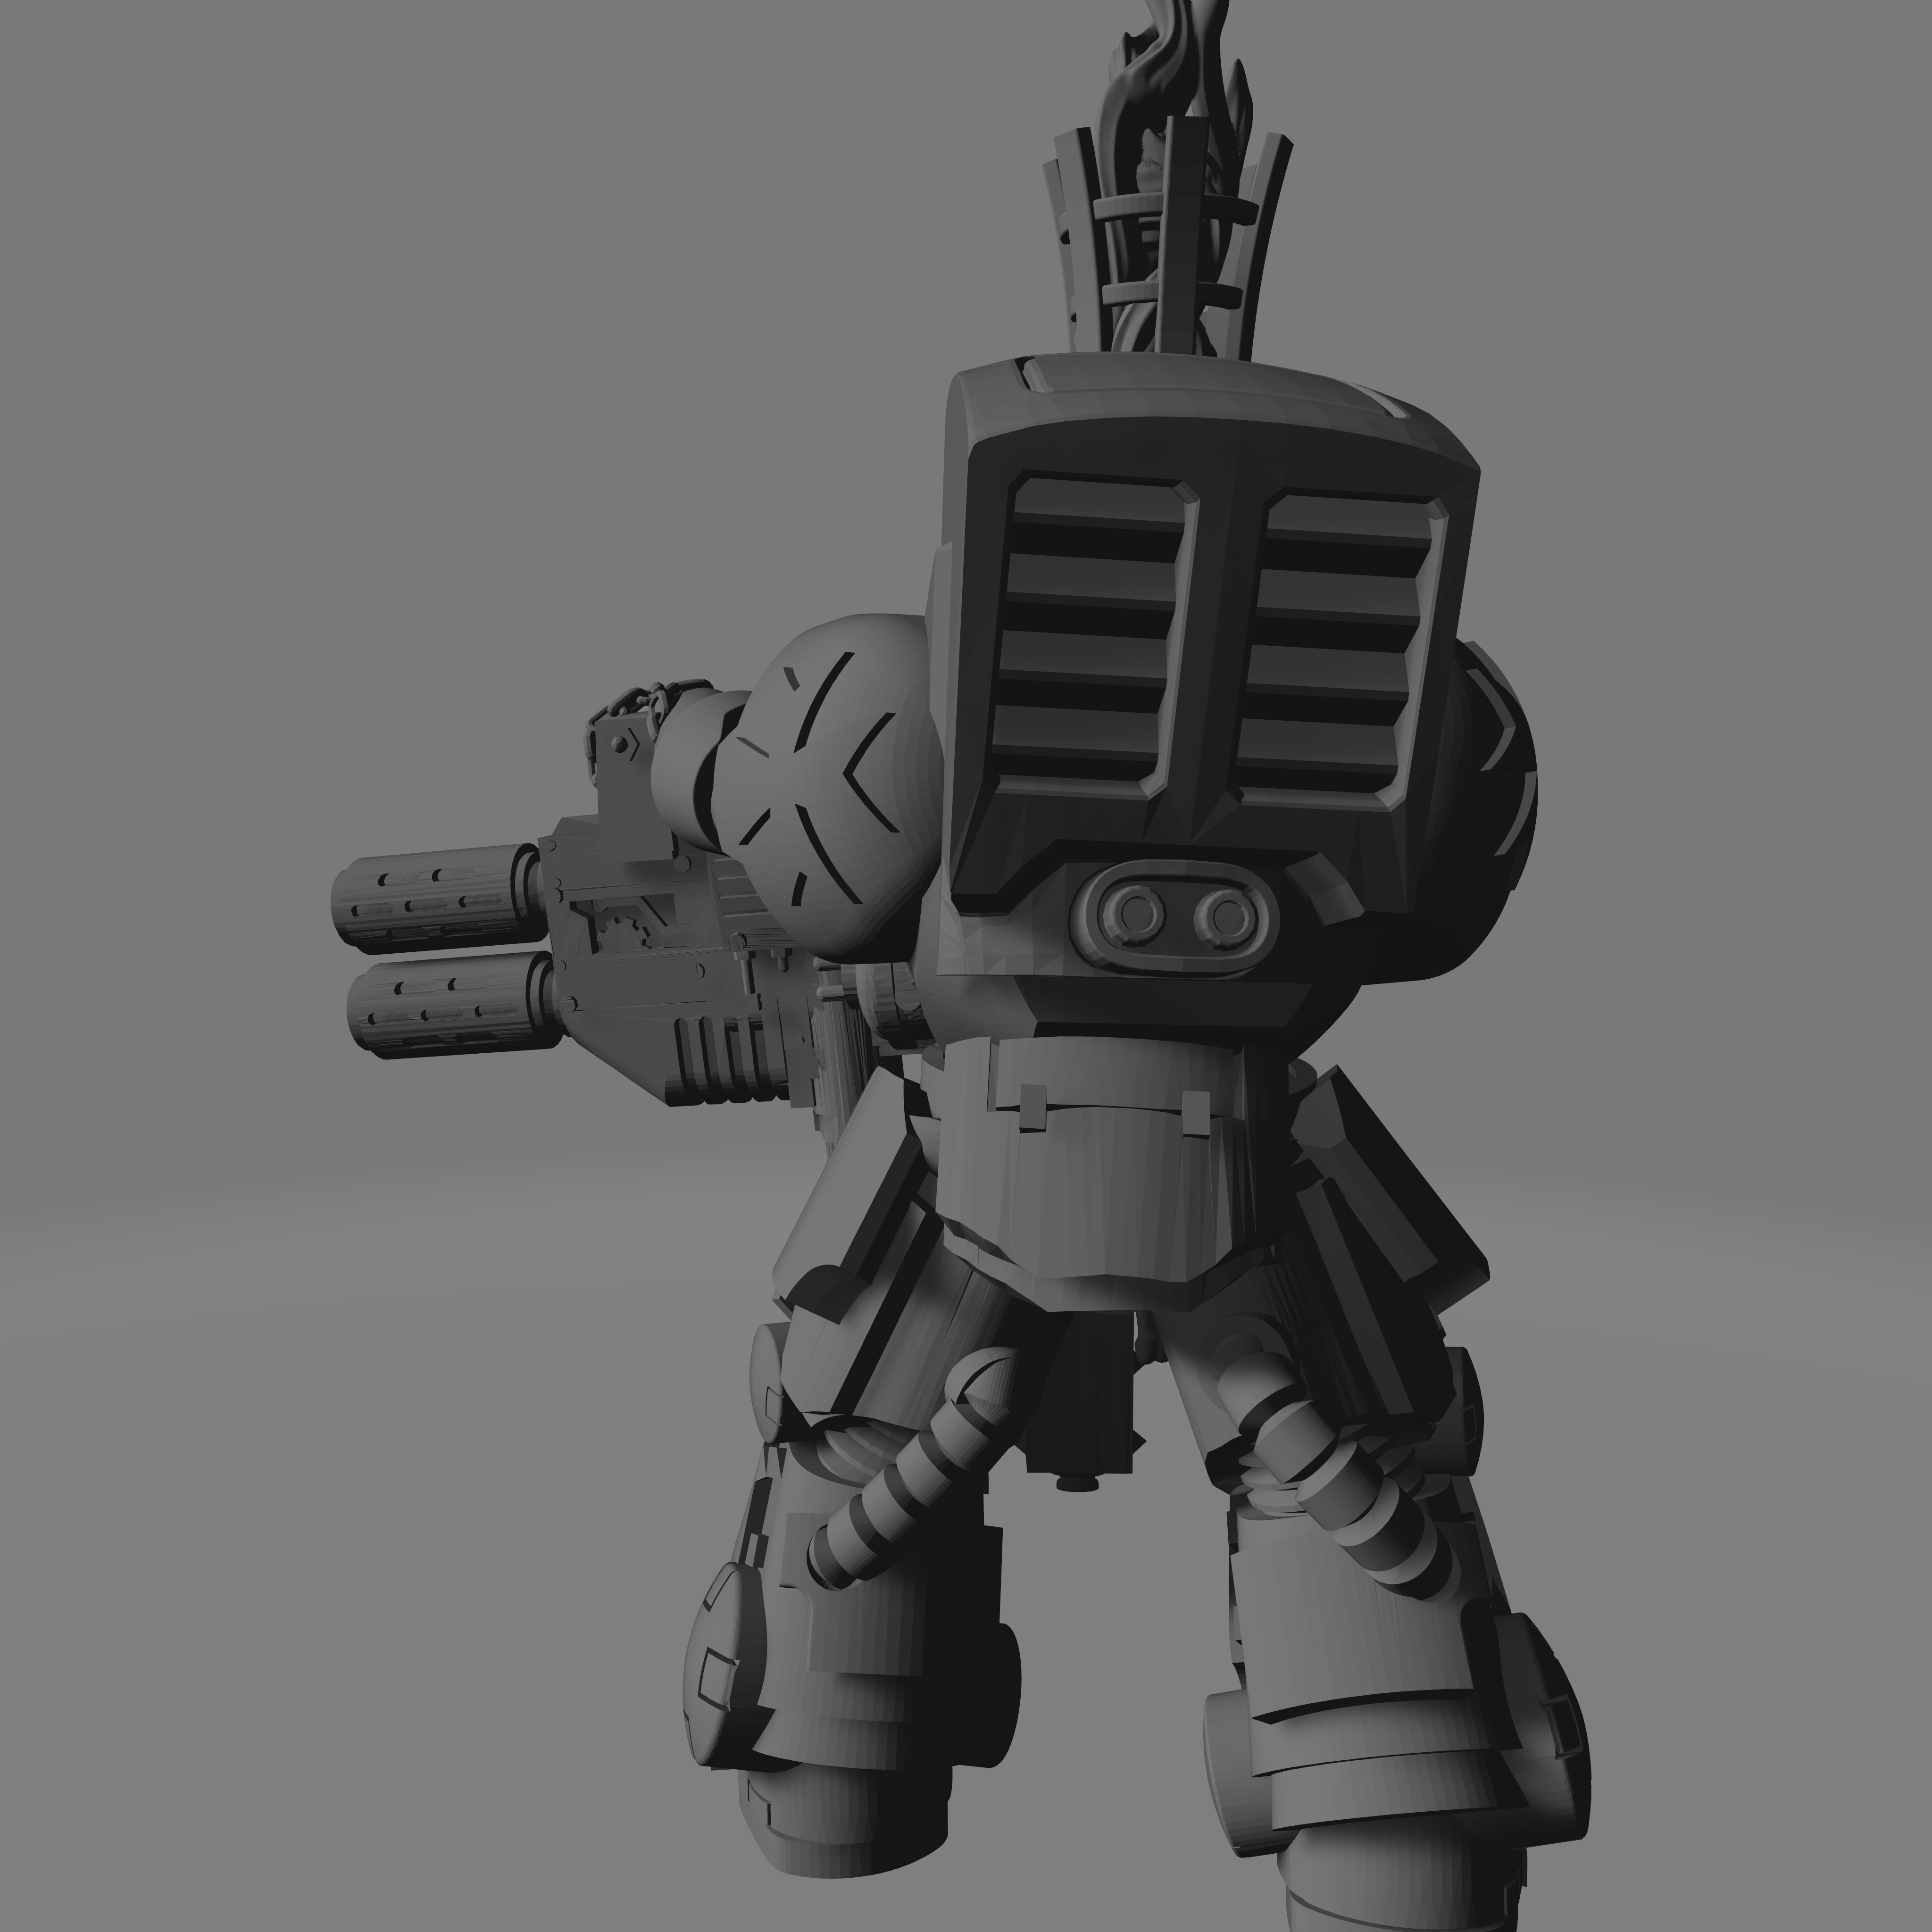 Dark Crusader Heavy Infantry Liquidators - 04 - Heavy 2.jpg Download free STL file Dark Crusader Heavy Infantry Liquidator Squad • 3D printing design, GrimmTheMaker